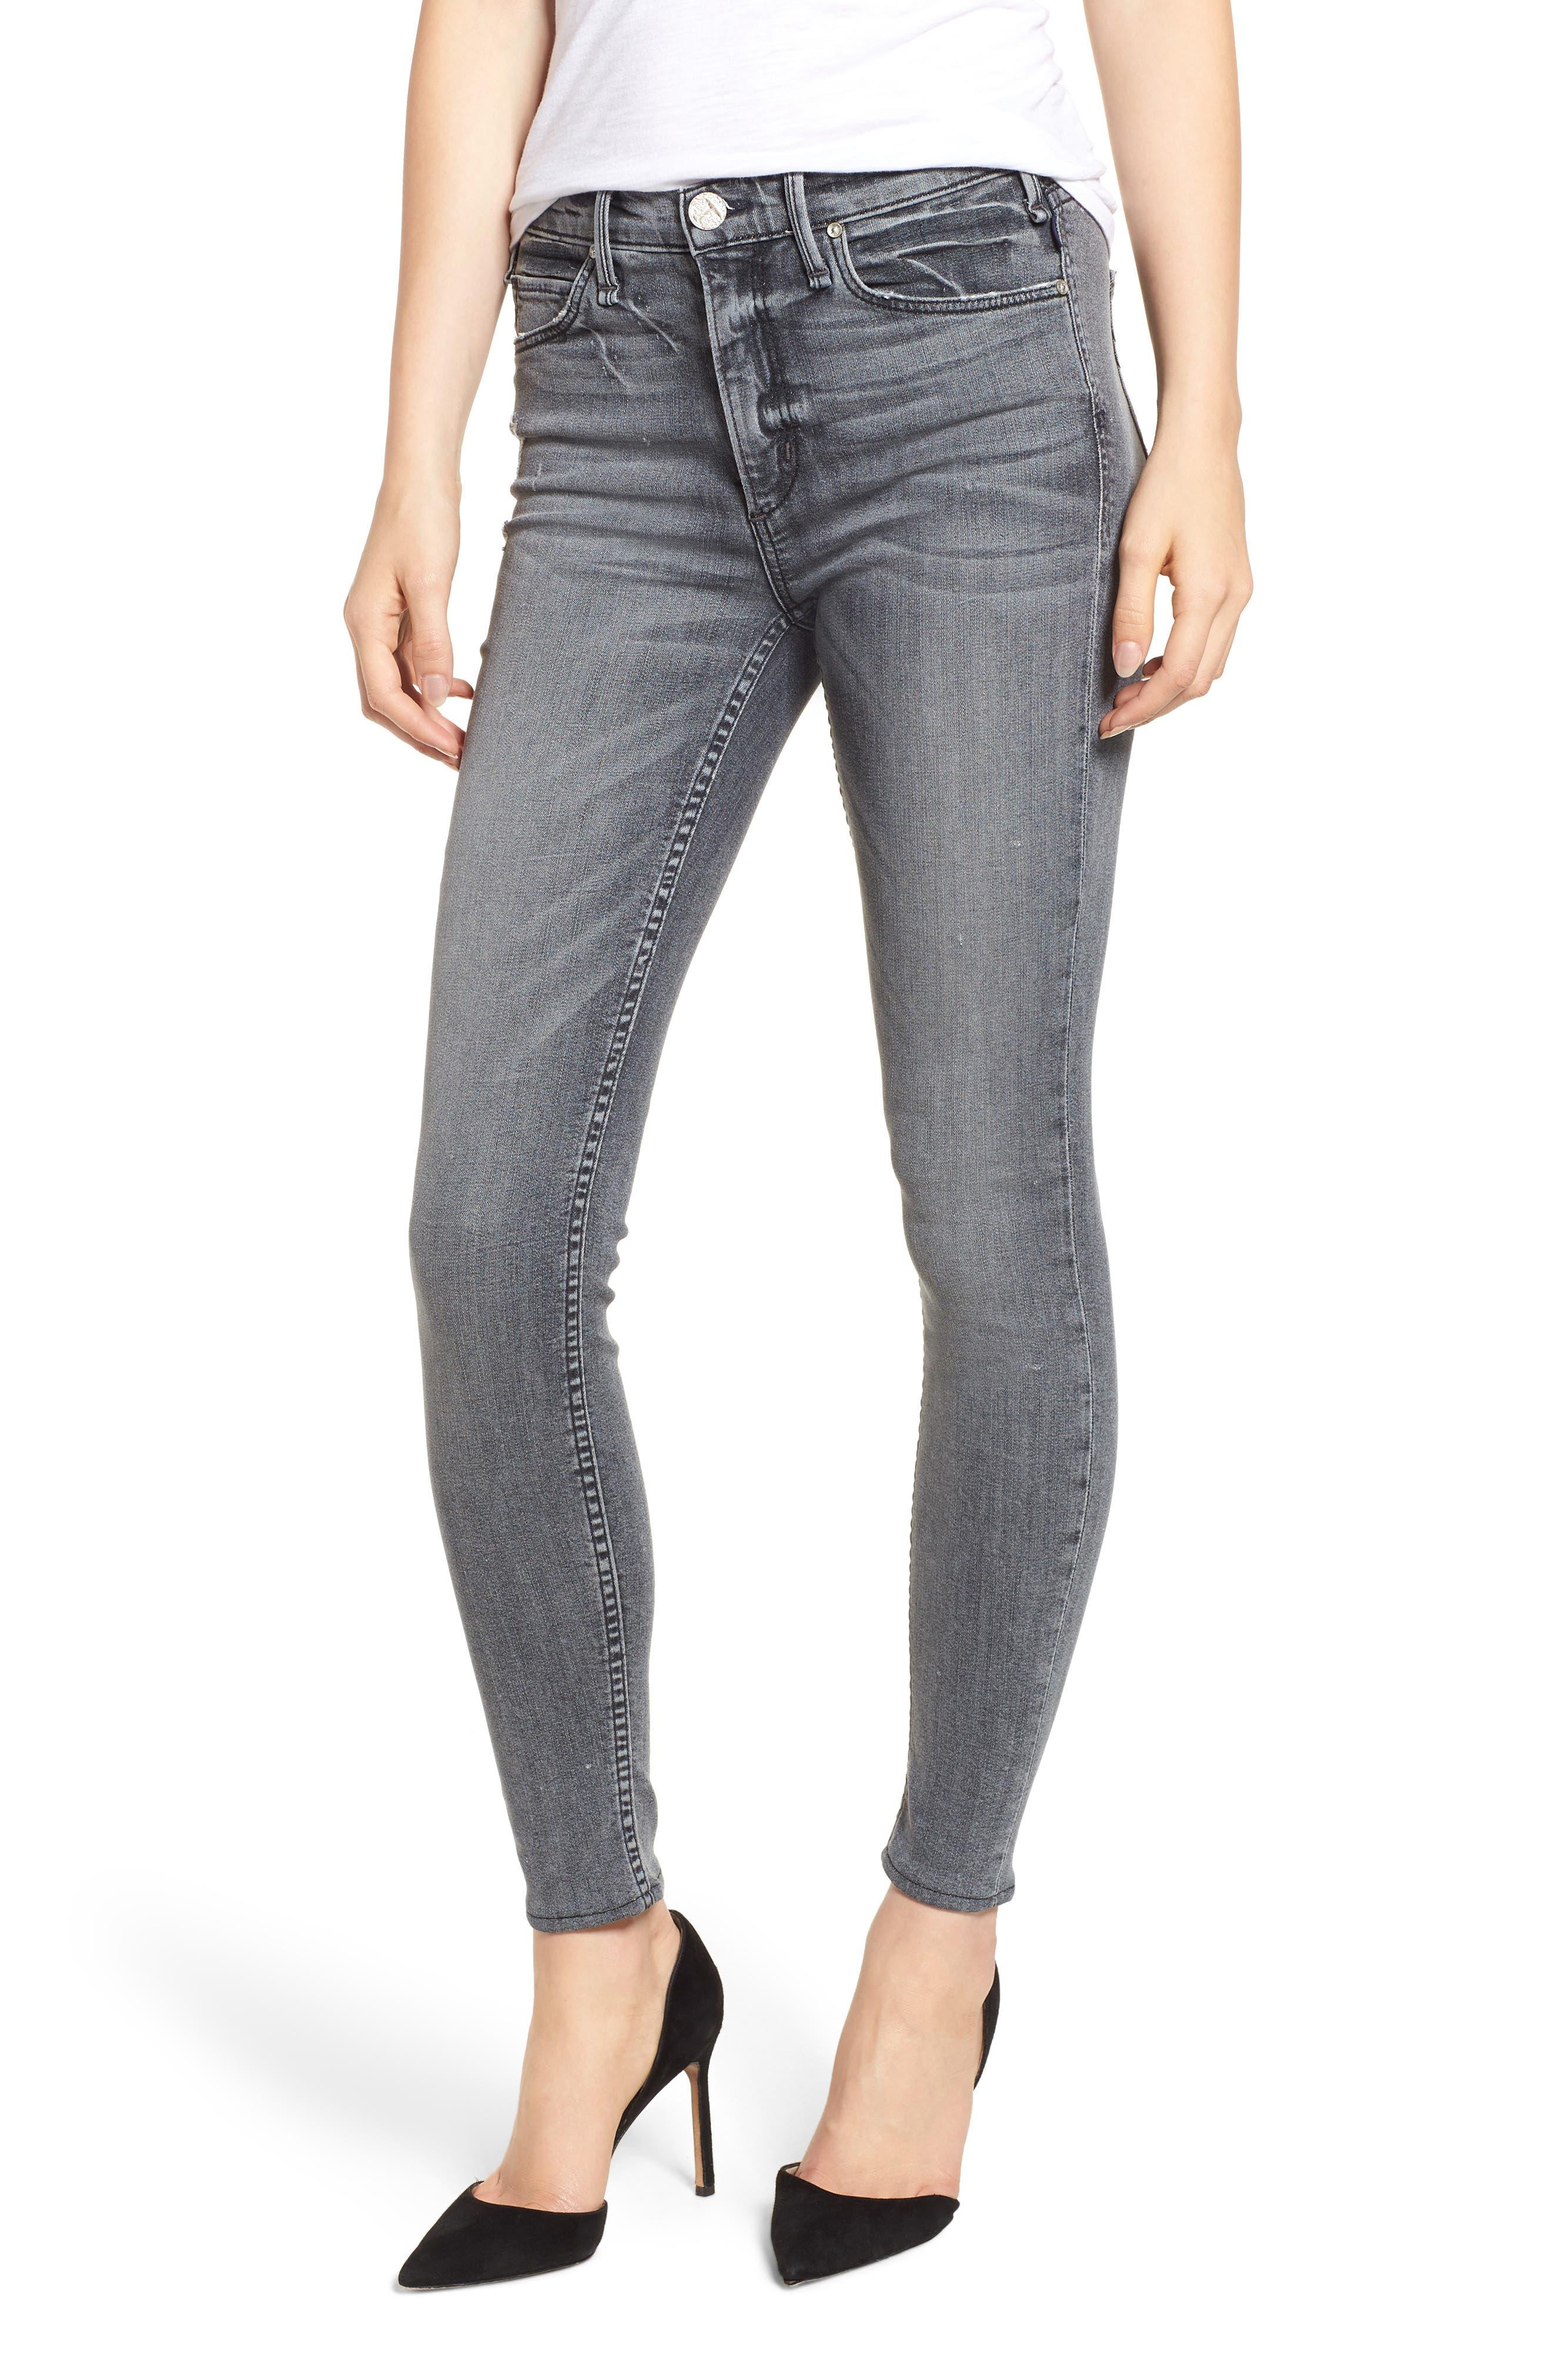 Newton High Waist Skinny Jeans,                             Main thumbnail 1, color,                             021